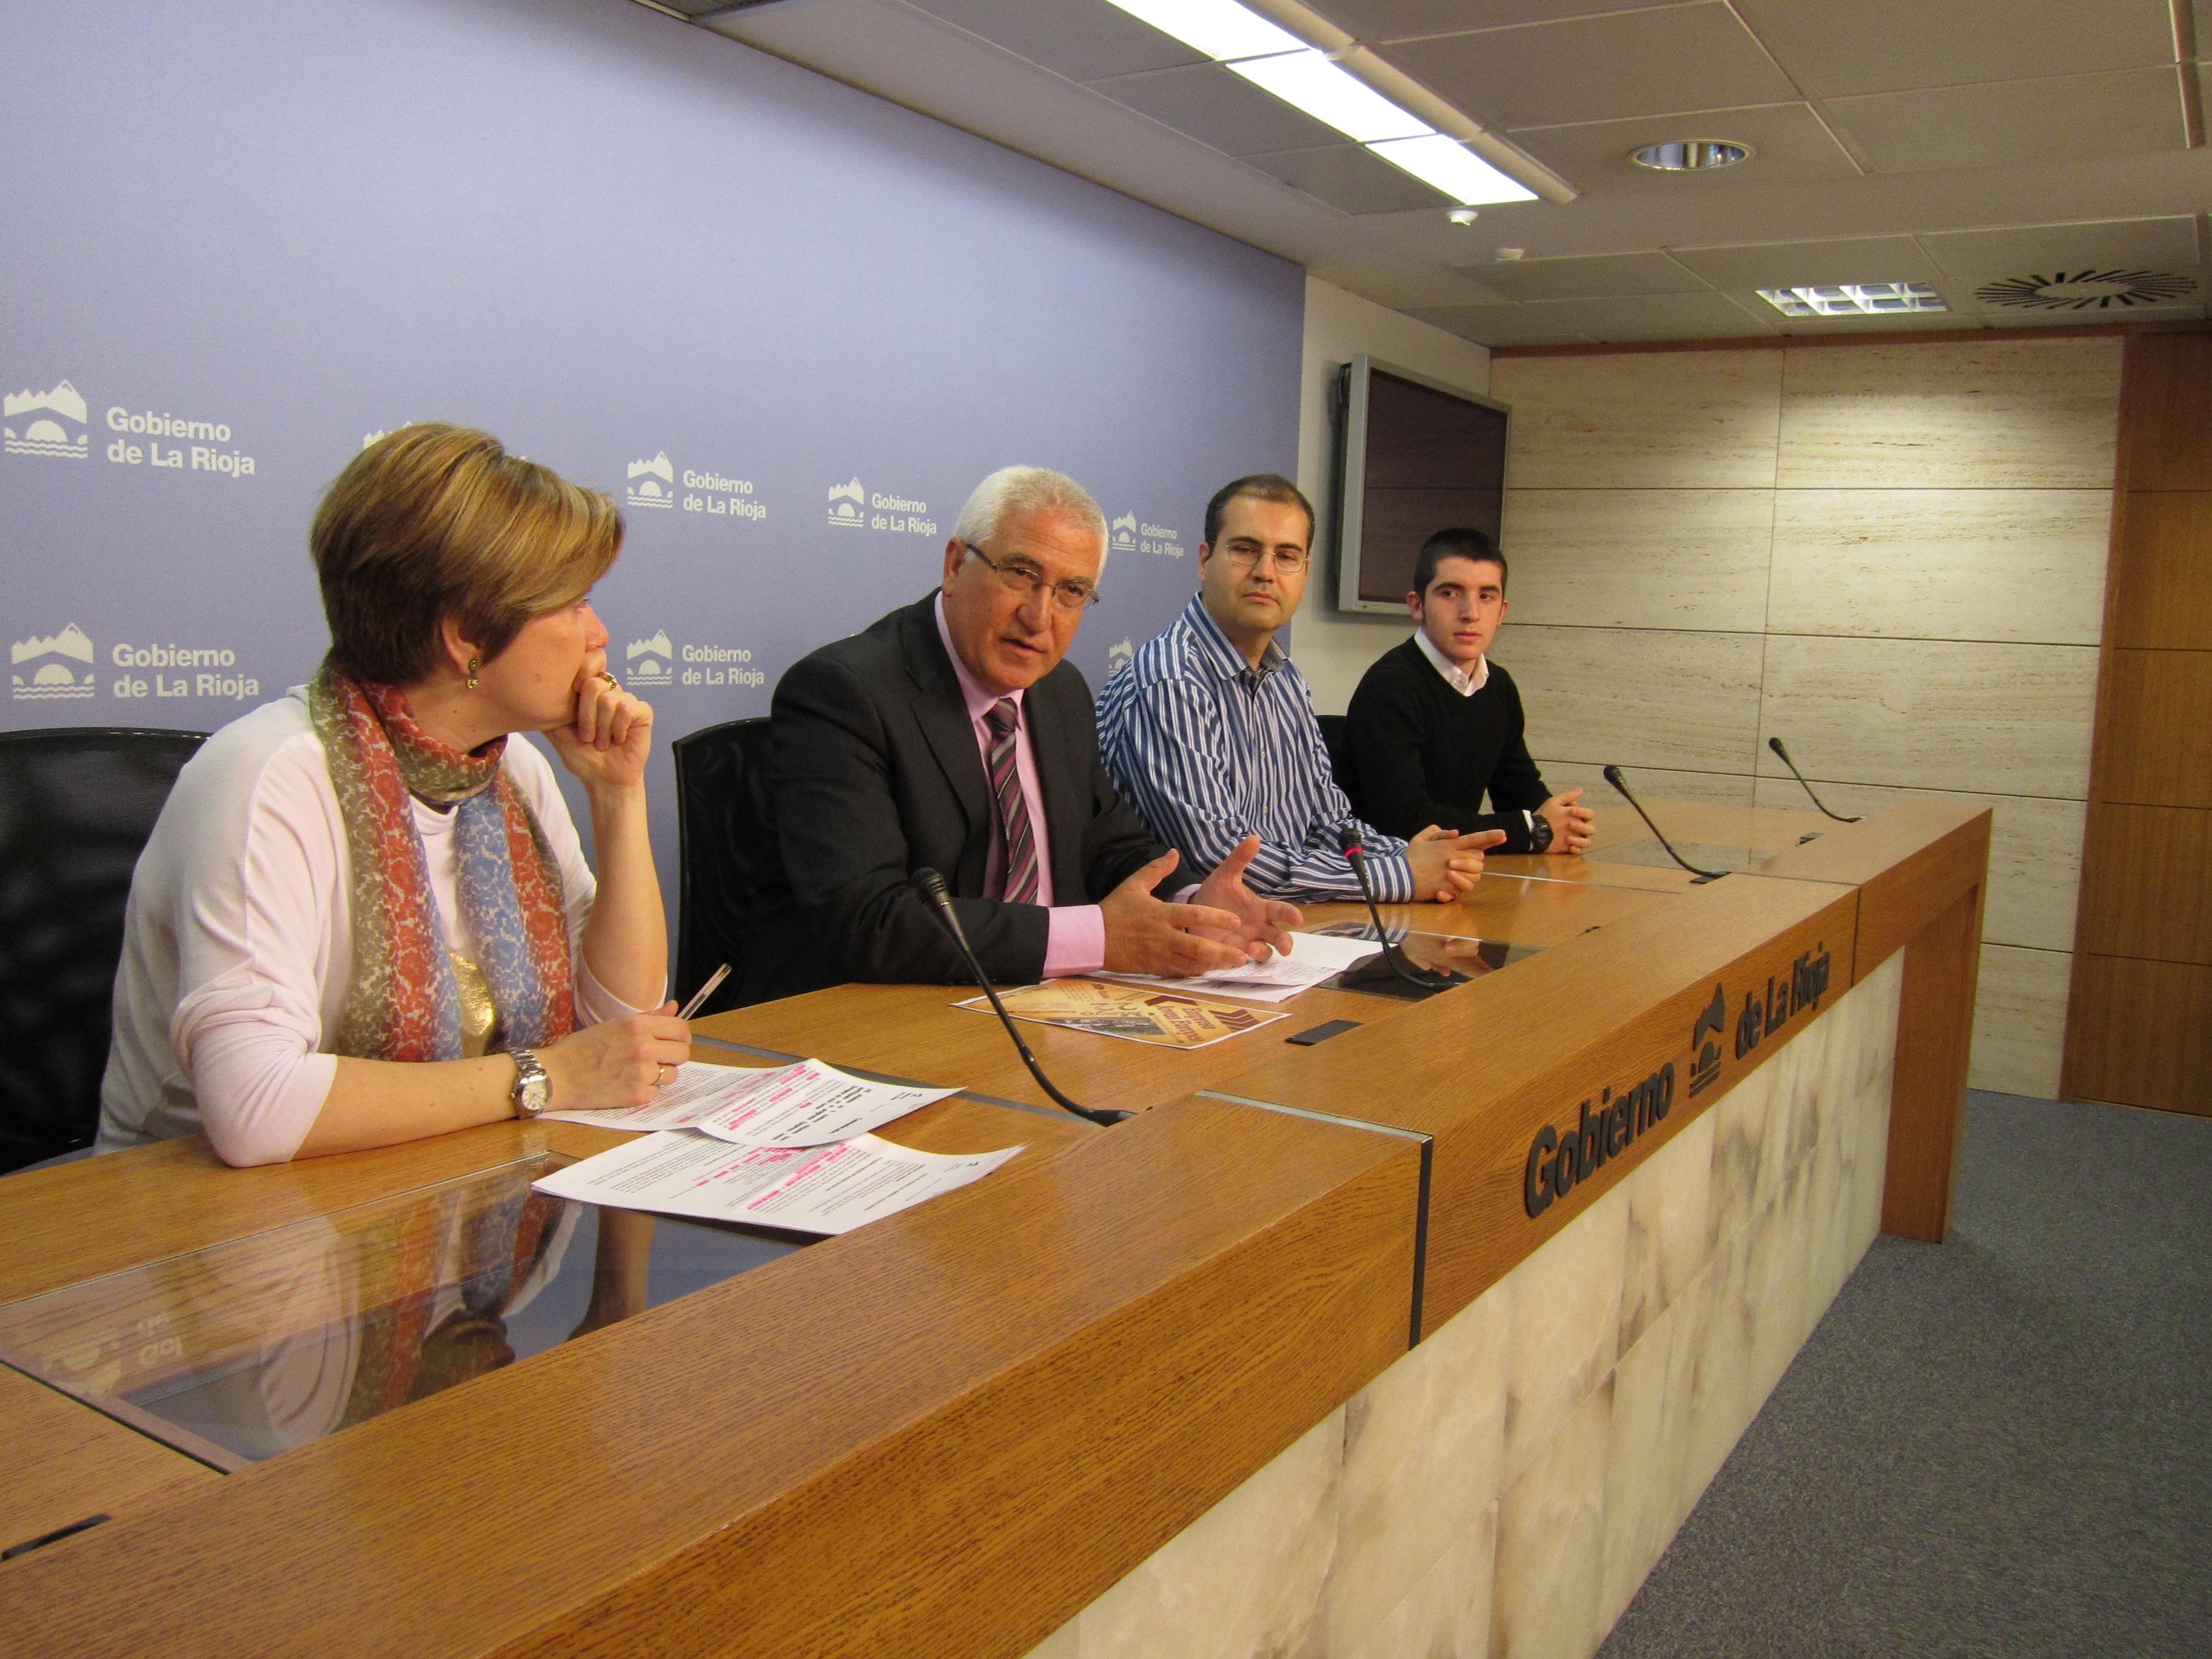 Un total de 218 alumnos de 8 centros riojanos participan en el programa Empresa Joven Europea